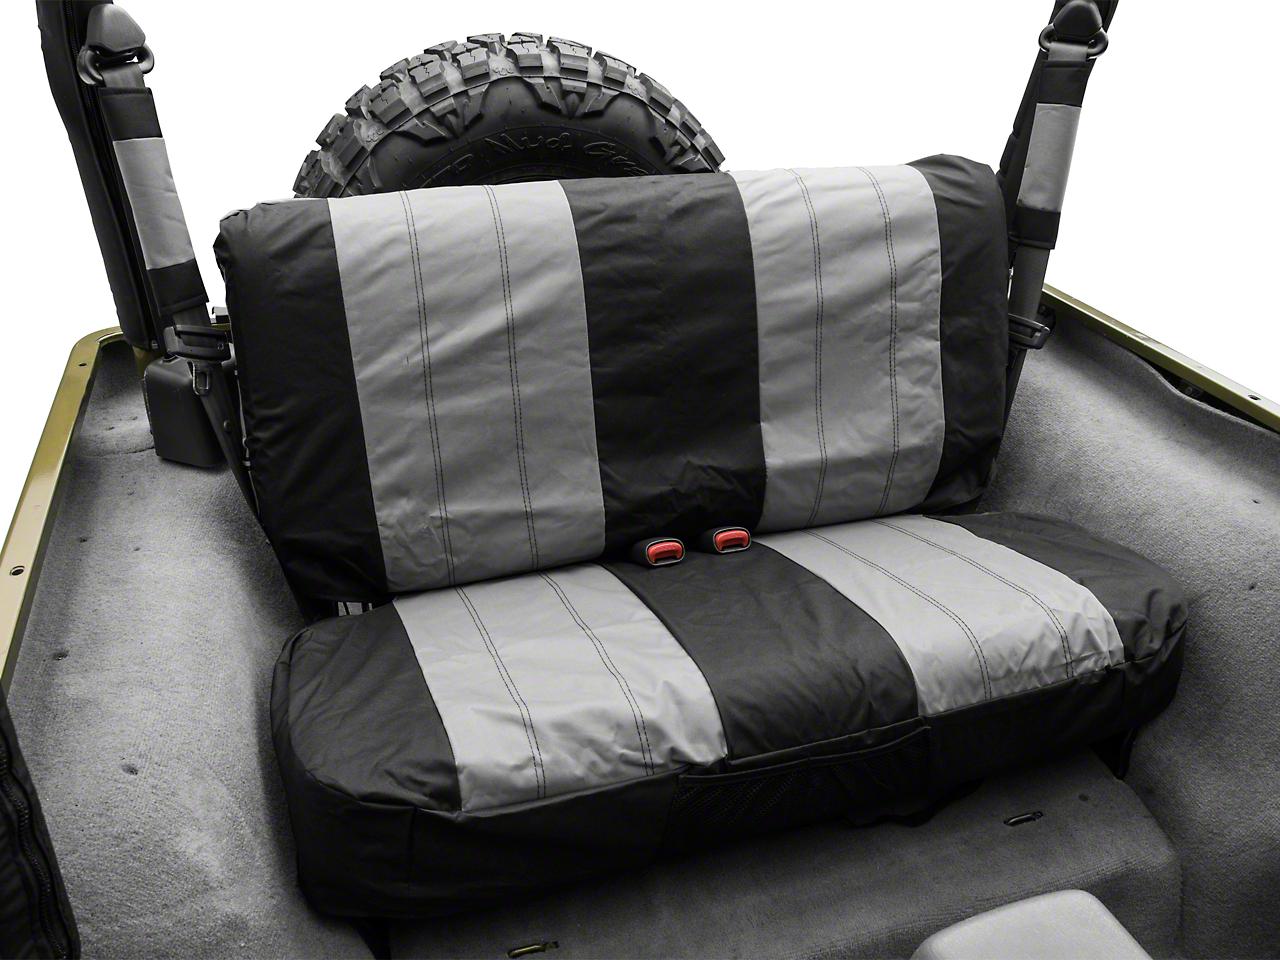 Crown Automotive Rear Seat Cover - Black/Gray (87-02 Wrangler YJ & TJ)